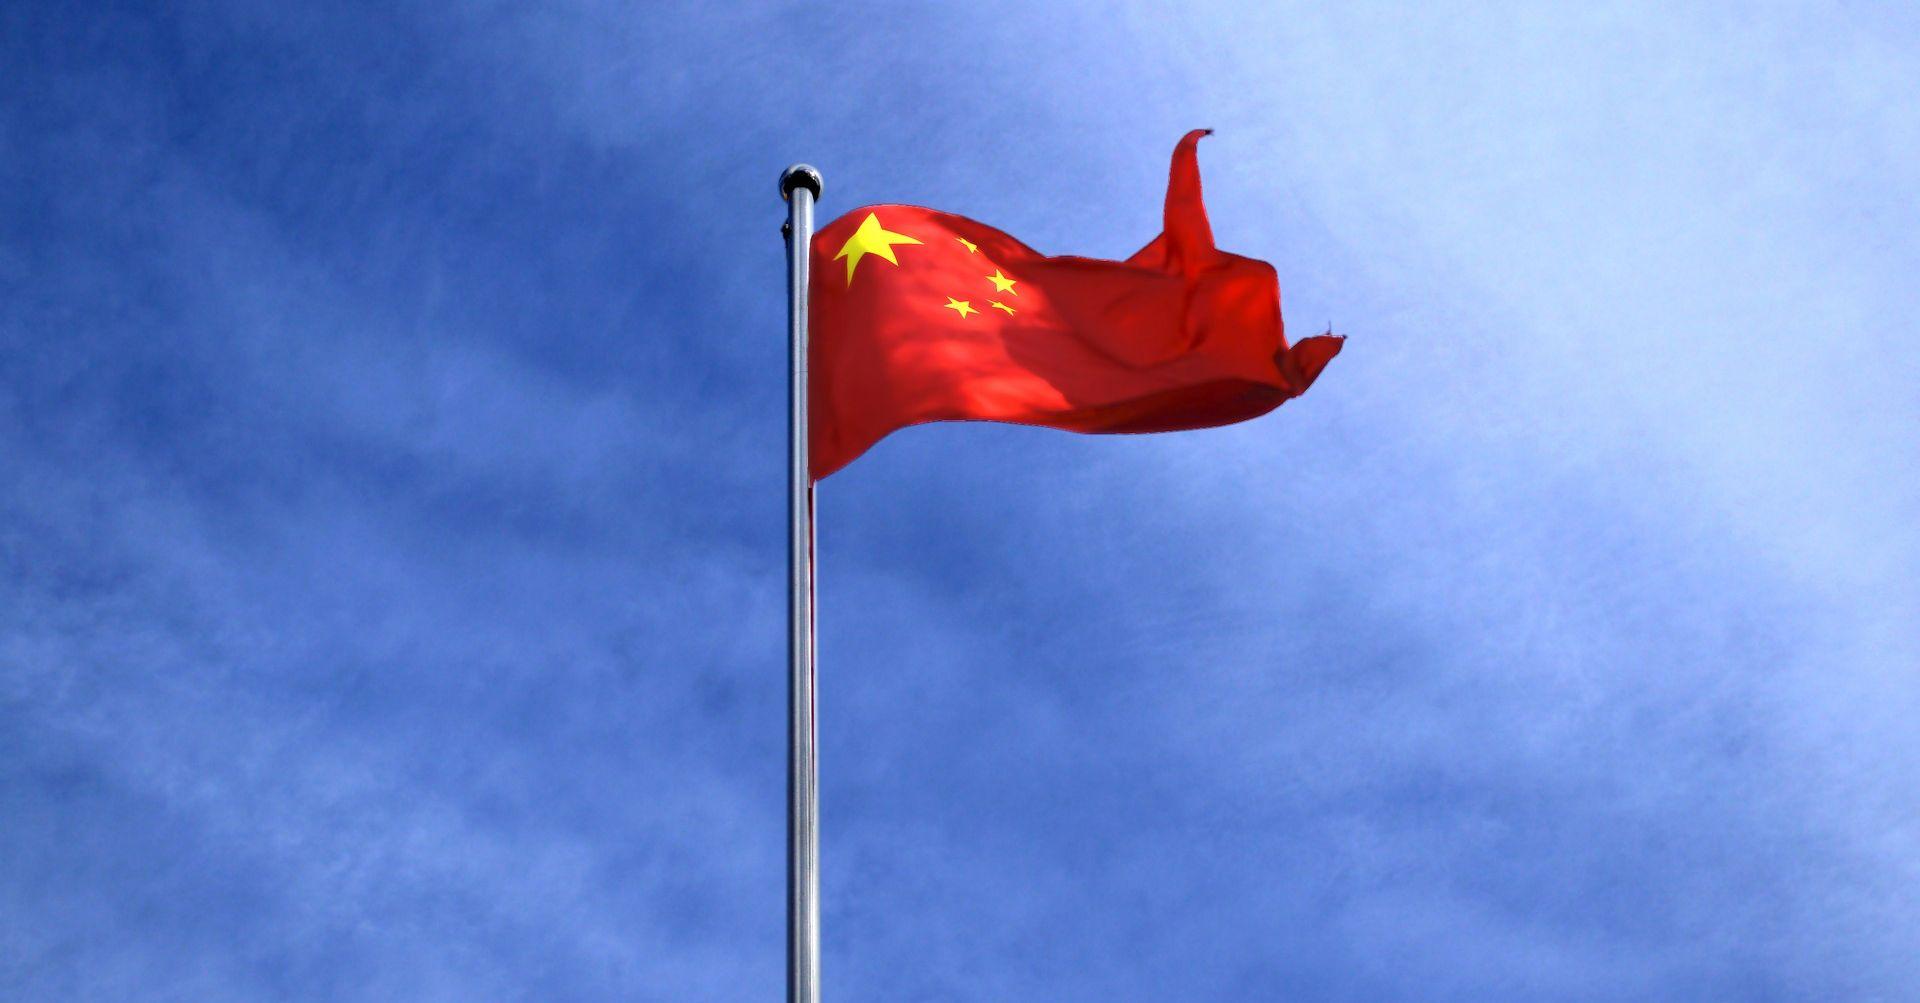 MEDIJI Treći Kanađanin pritvoren u Kini